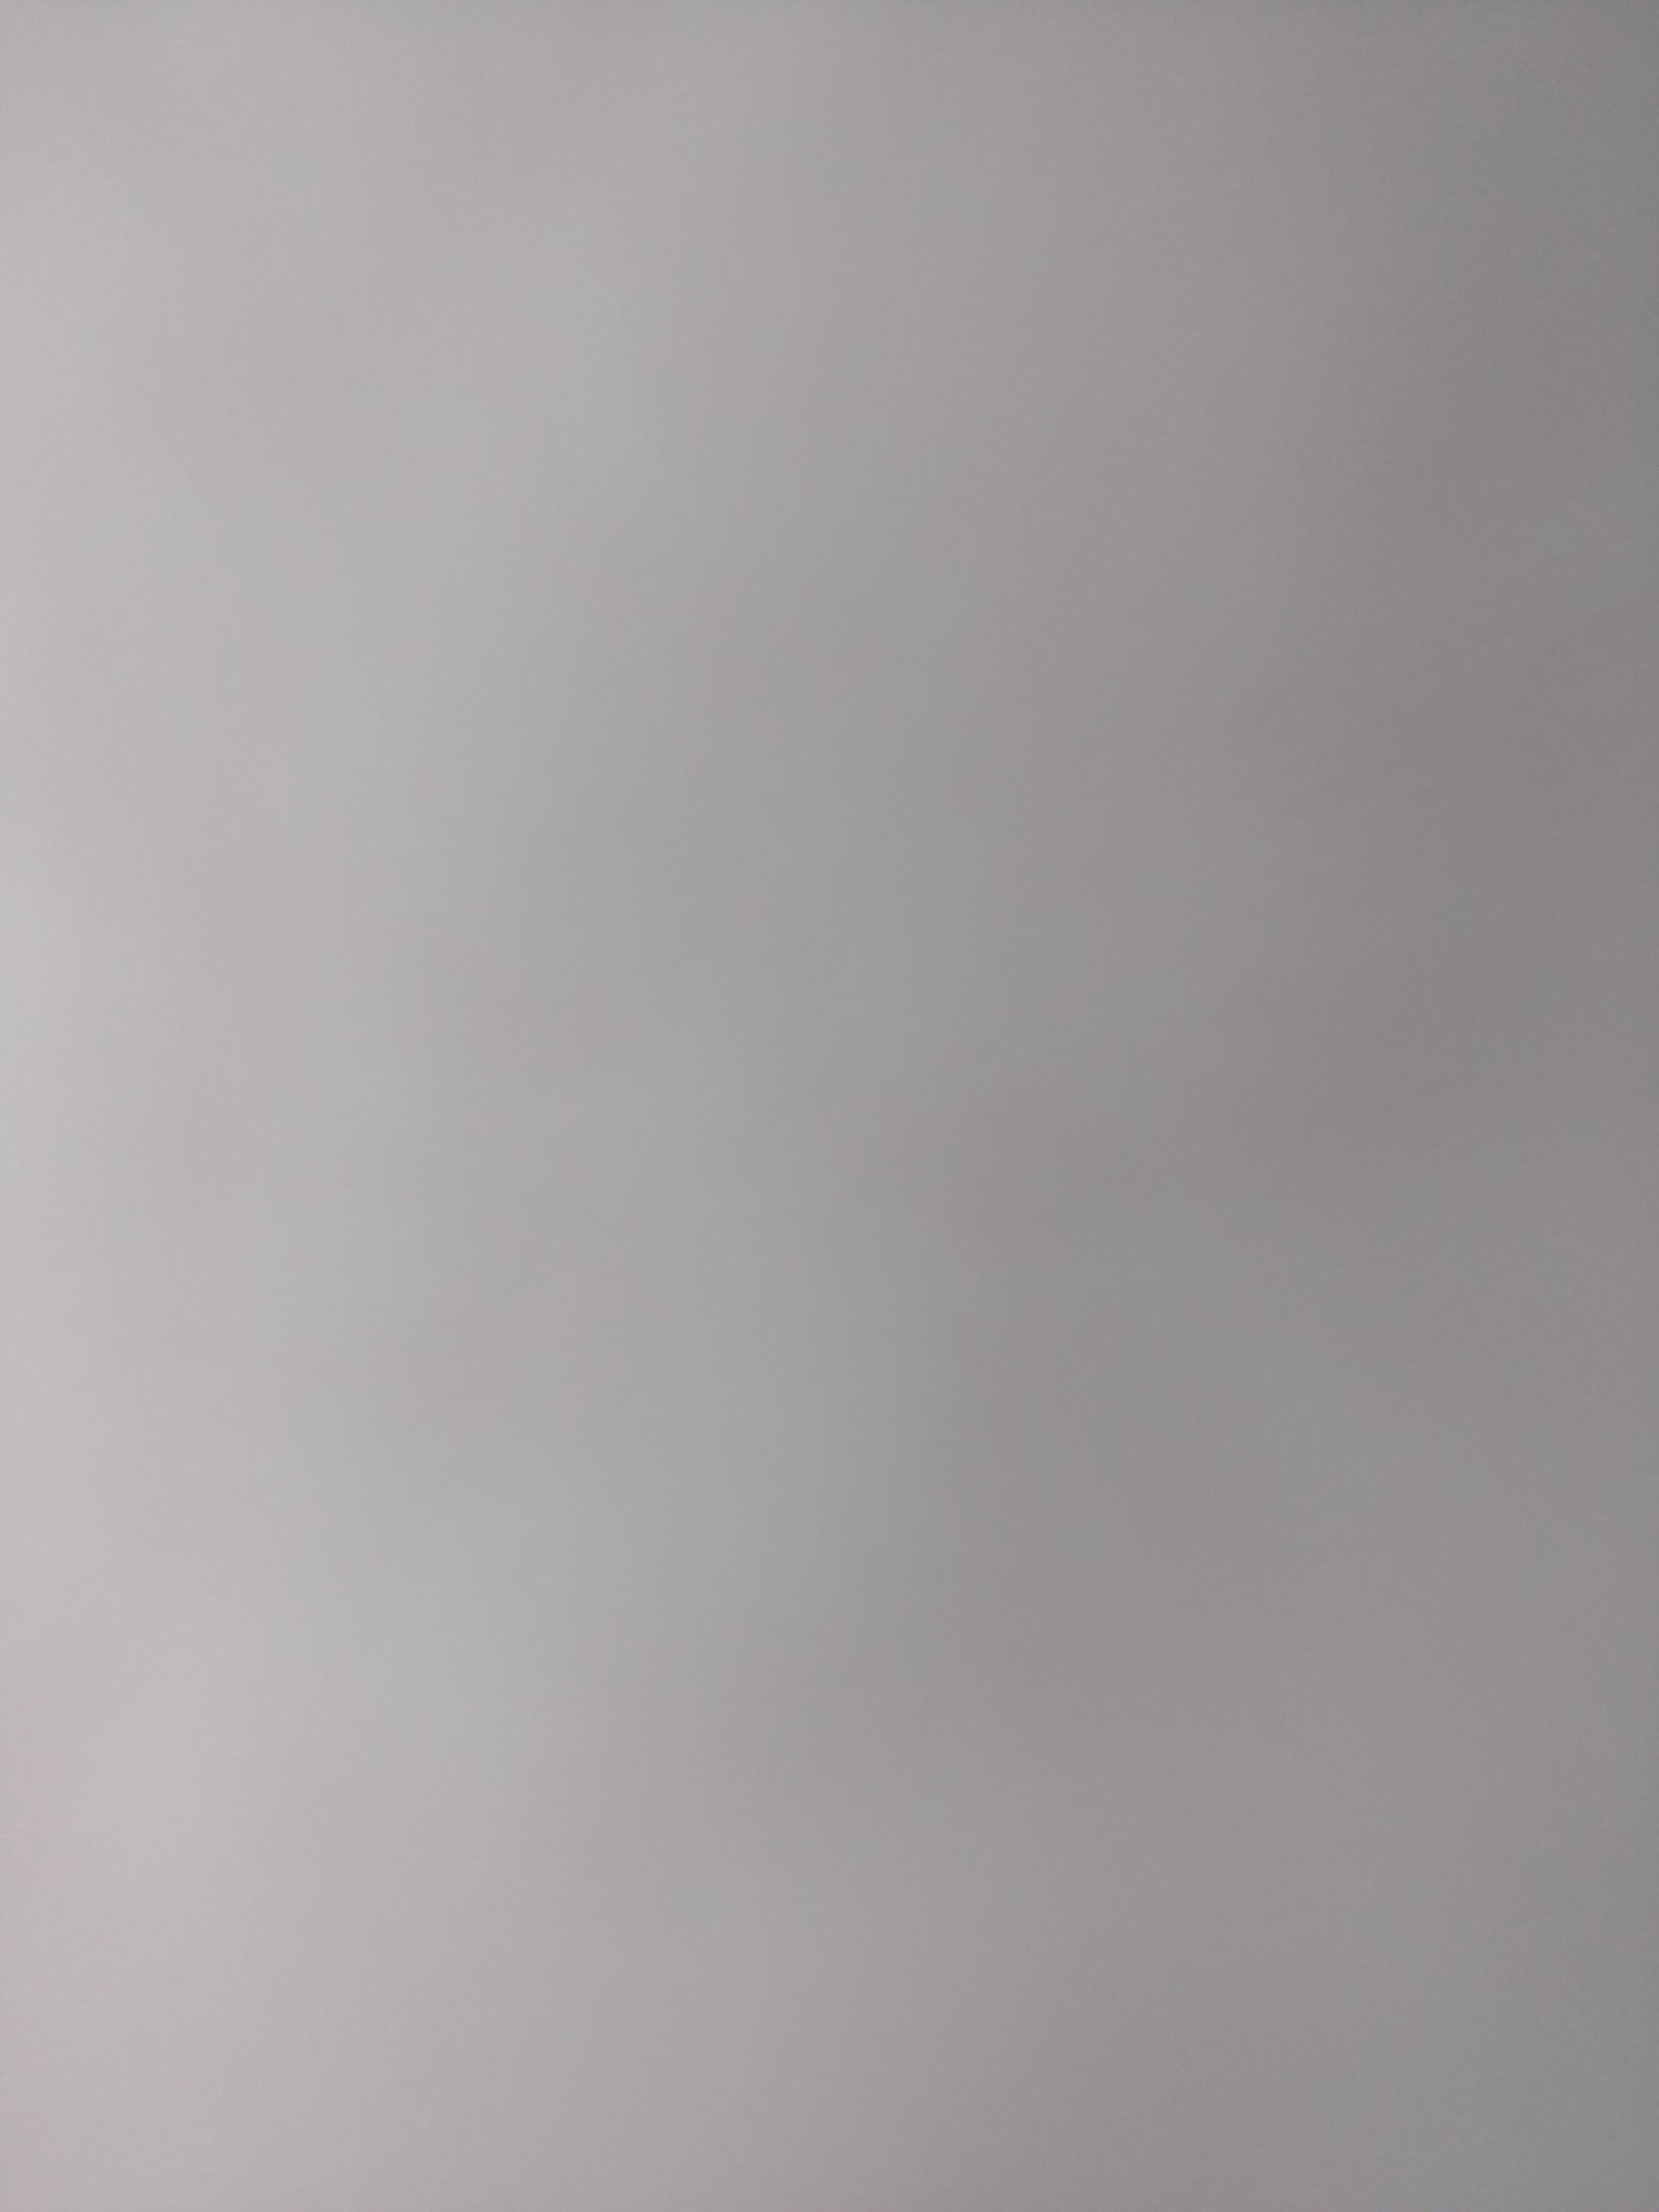 willroth-co-free-texture-gradient-092.jpg